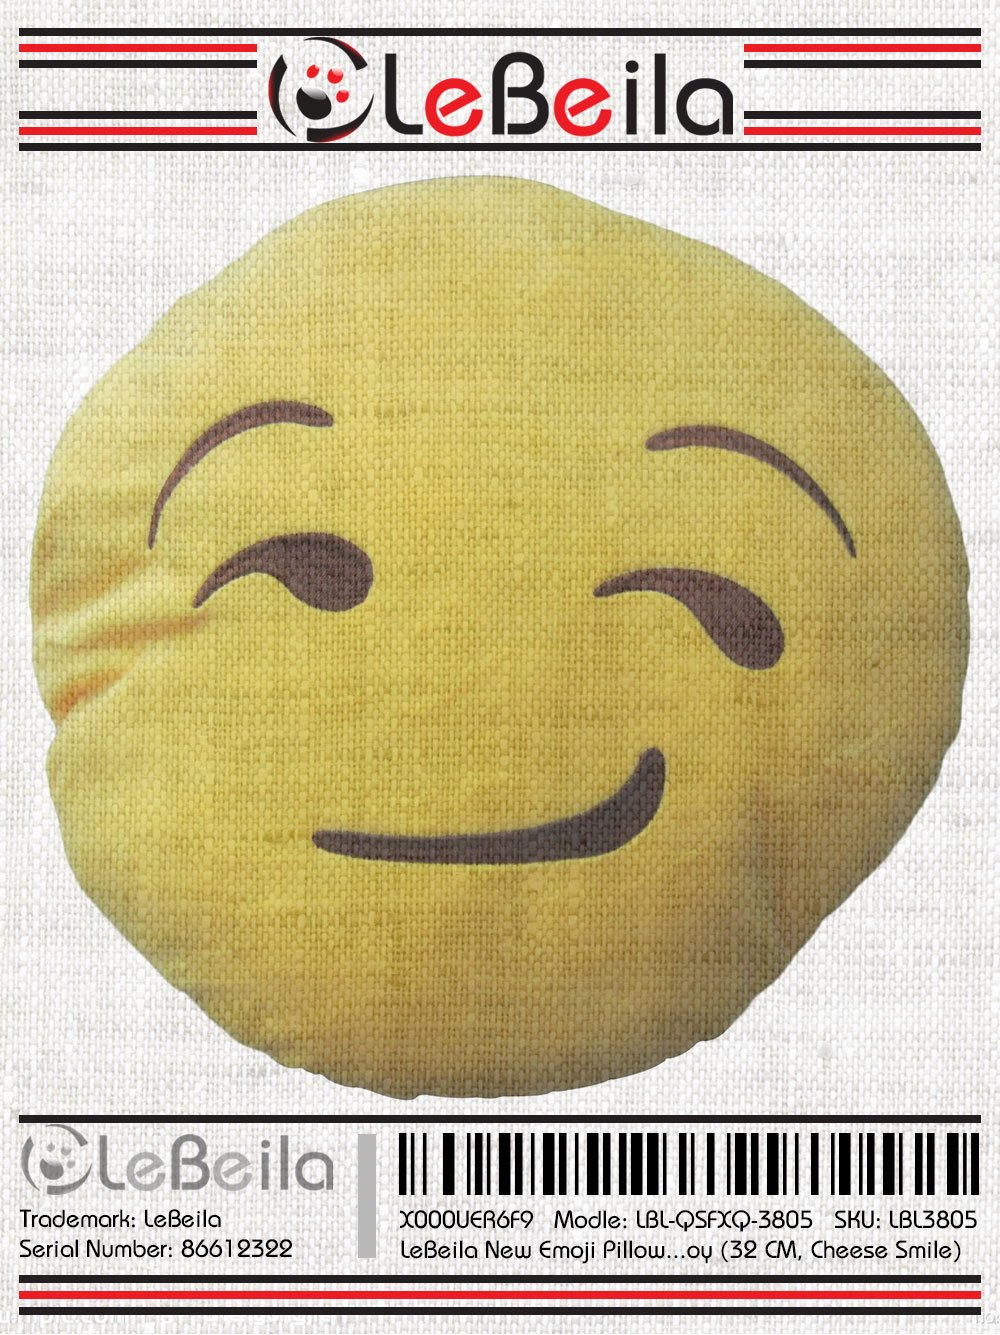 amazon com lebeila new emoji pillow big smiley happy laughing face